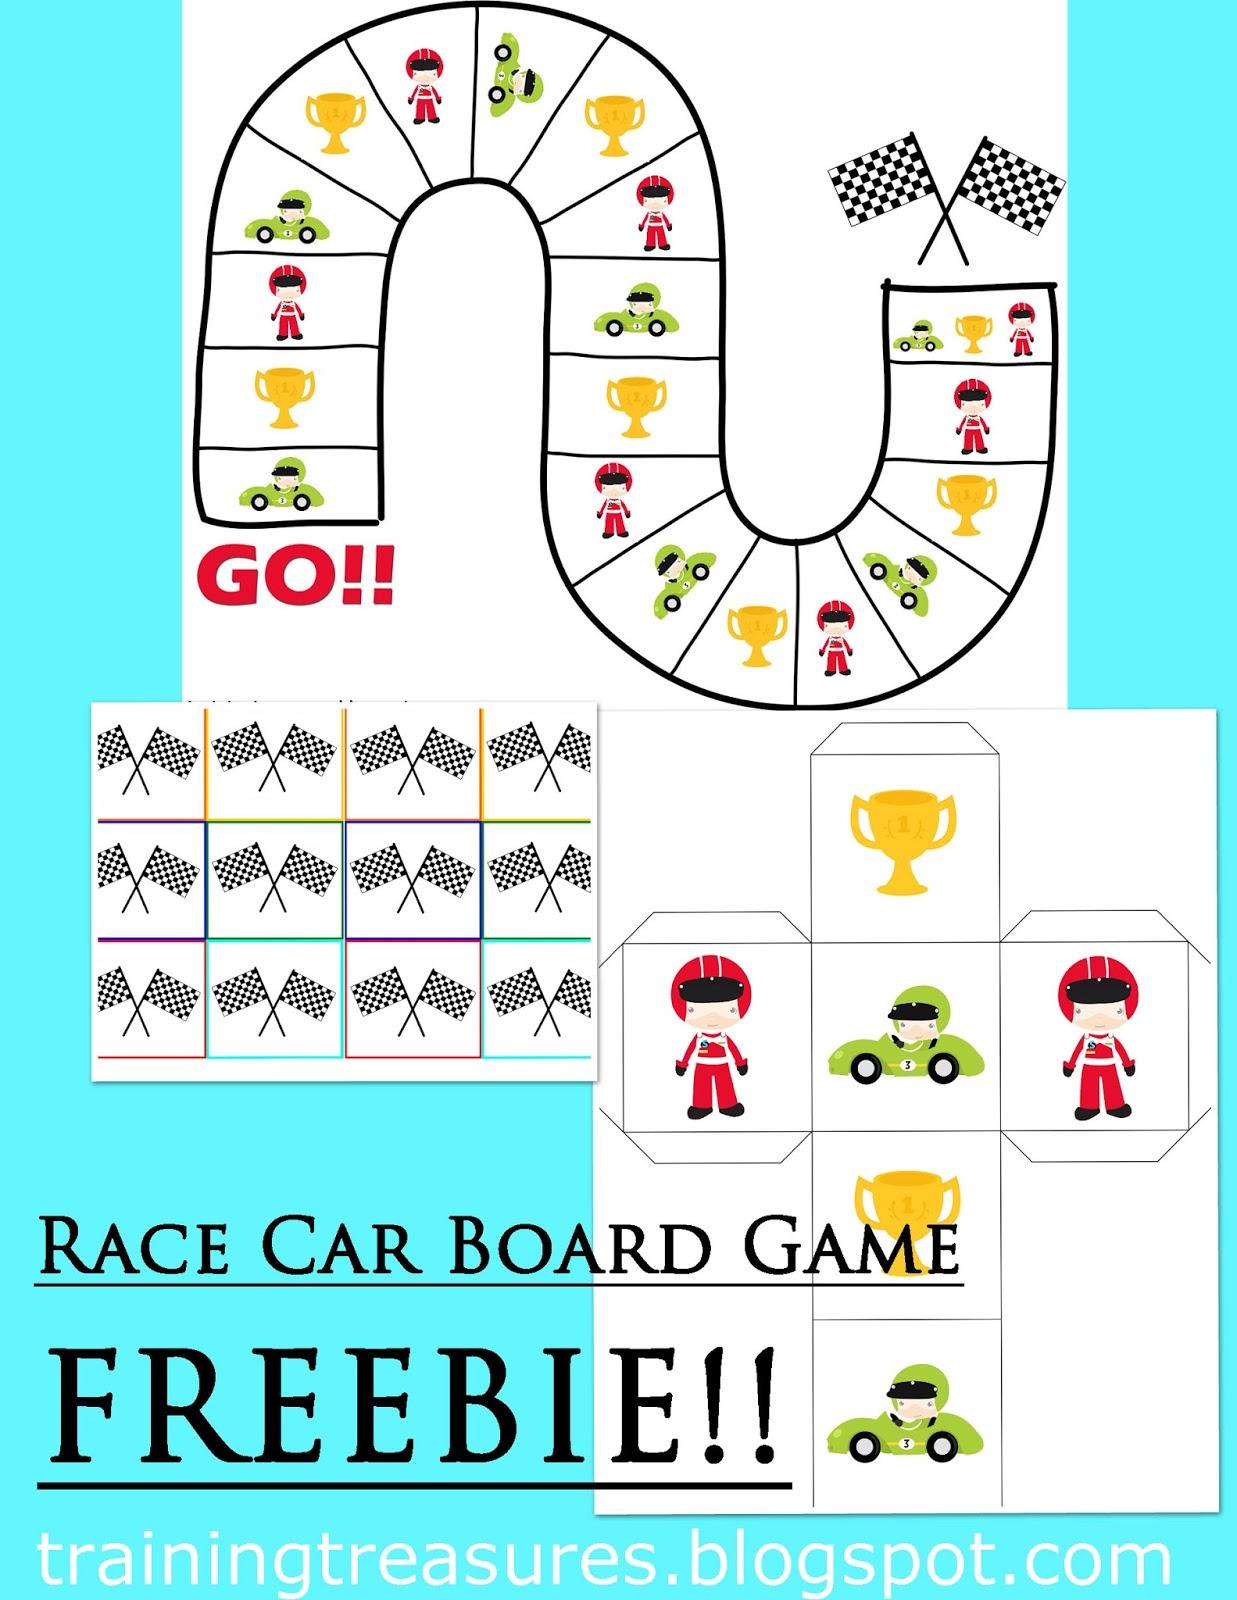 Training Treasures Race Car Board Game Freebie